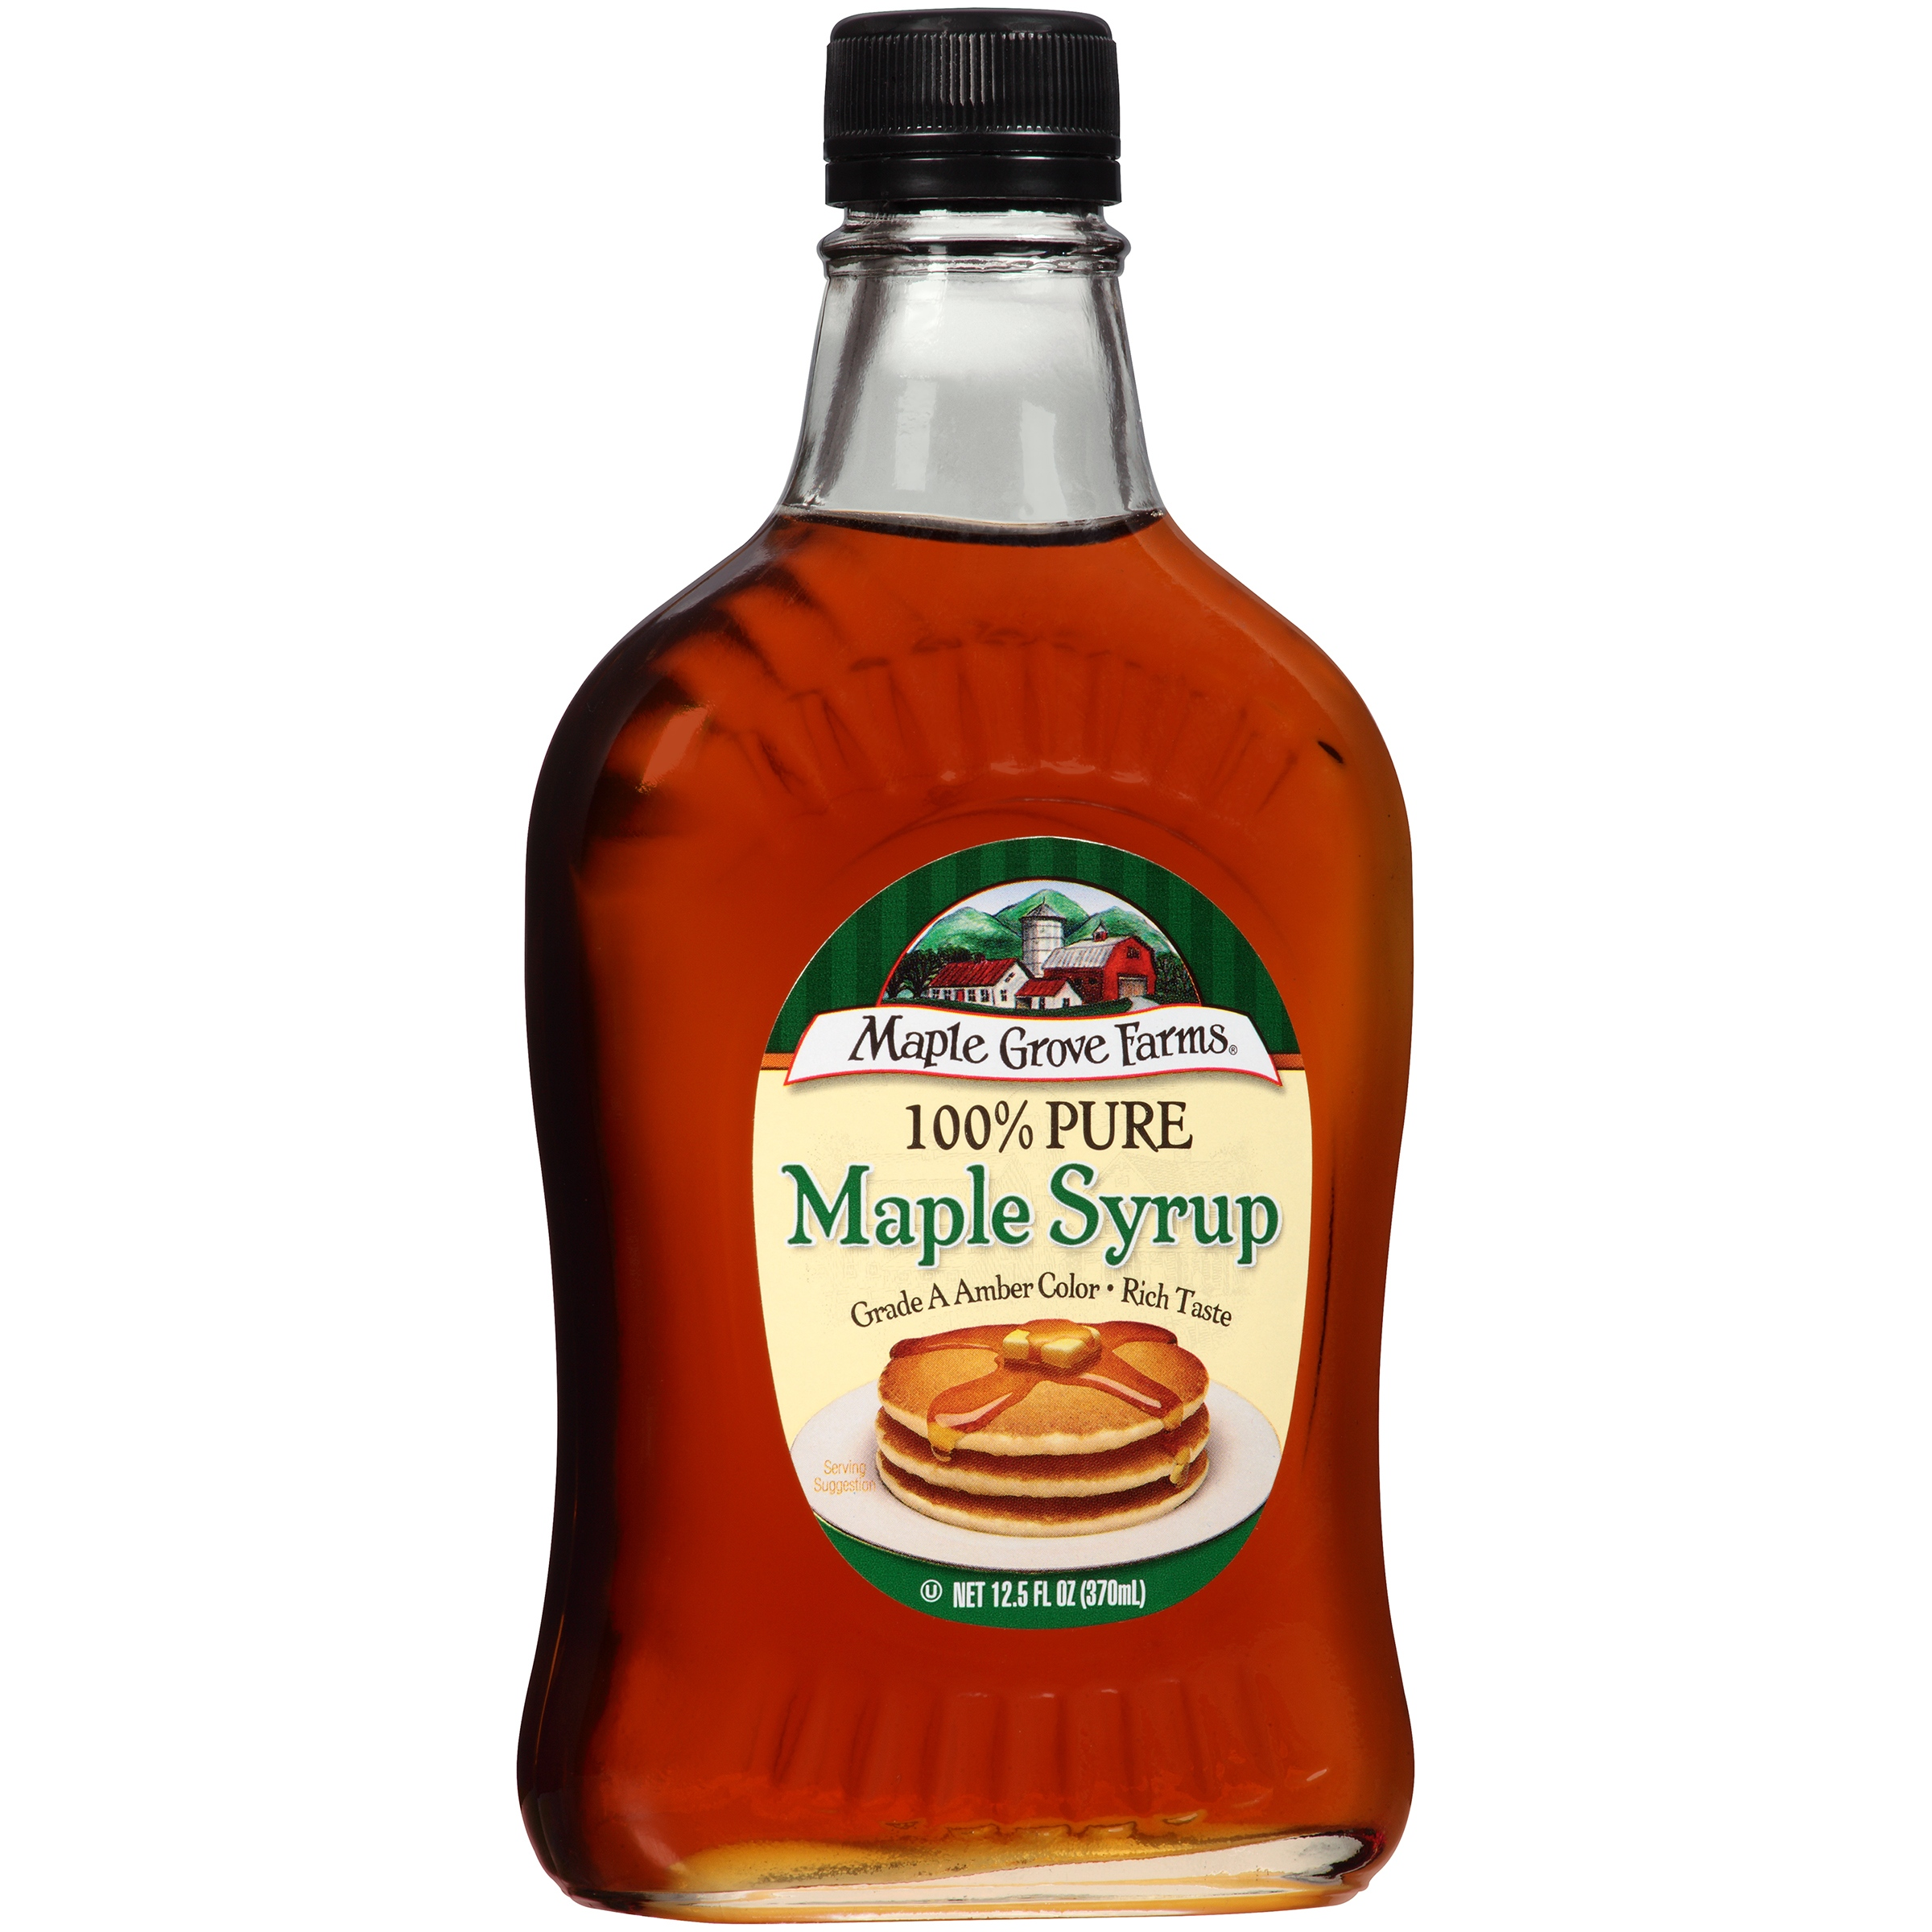 Maple Grove Farms 100 Pure Maple Syrup 125 fl oz